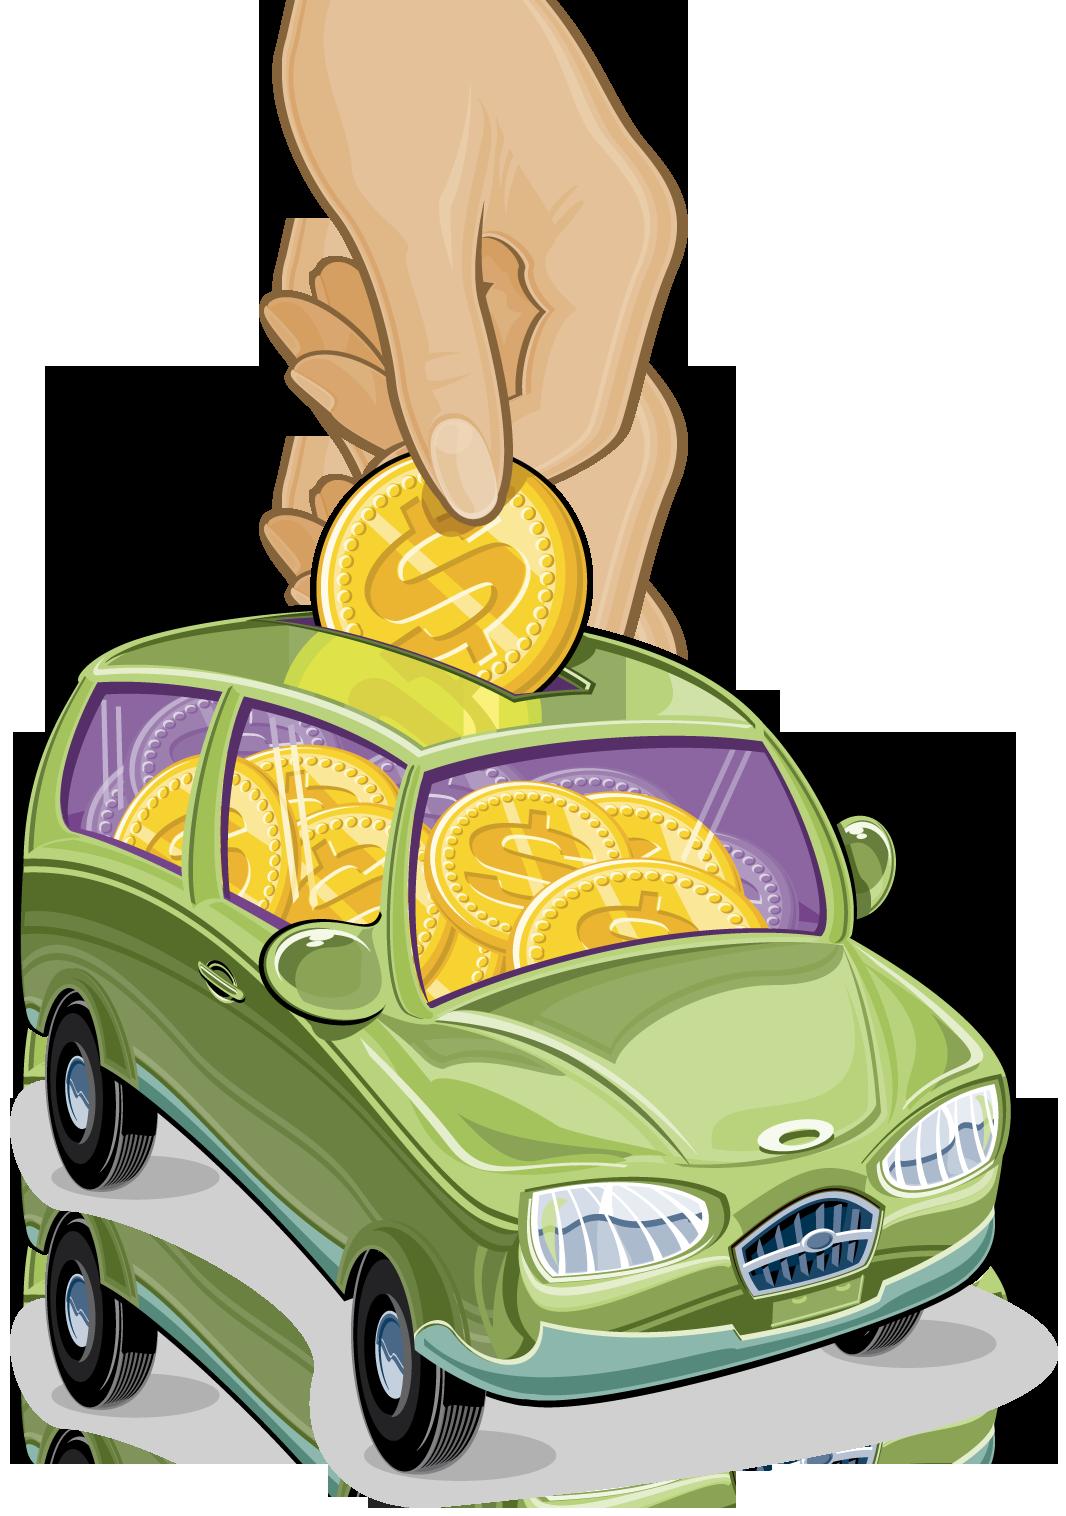 Car salesperson clipart jpg freeuse stock Buy My First Car | DriveTime Advice Center jpg freeuse stock